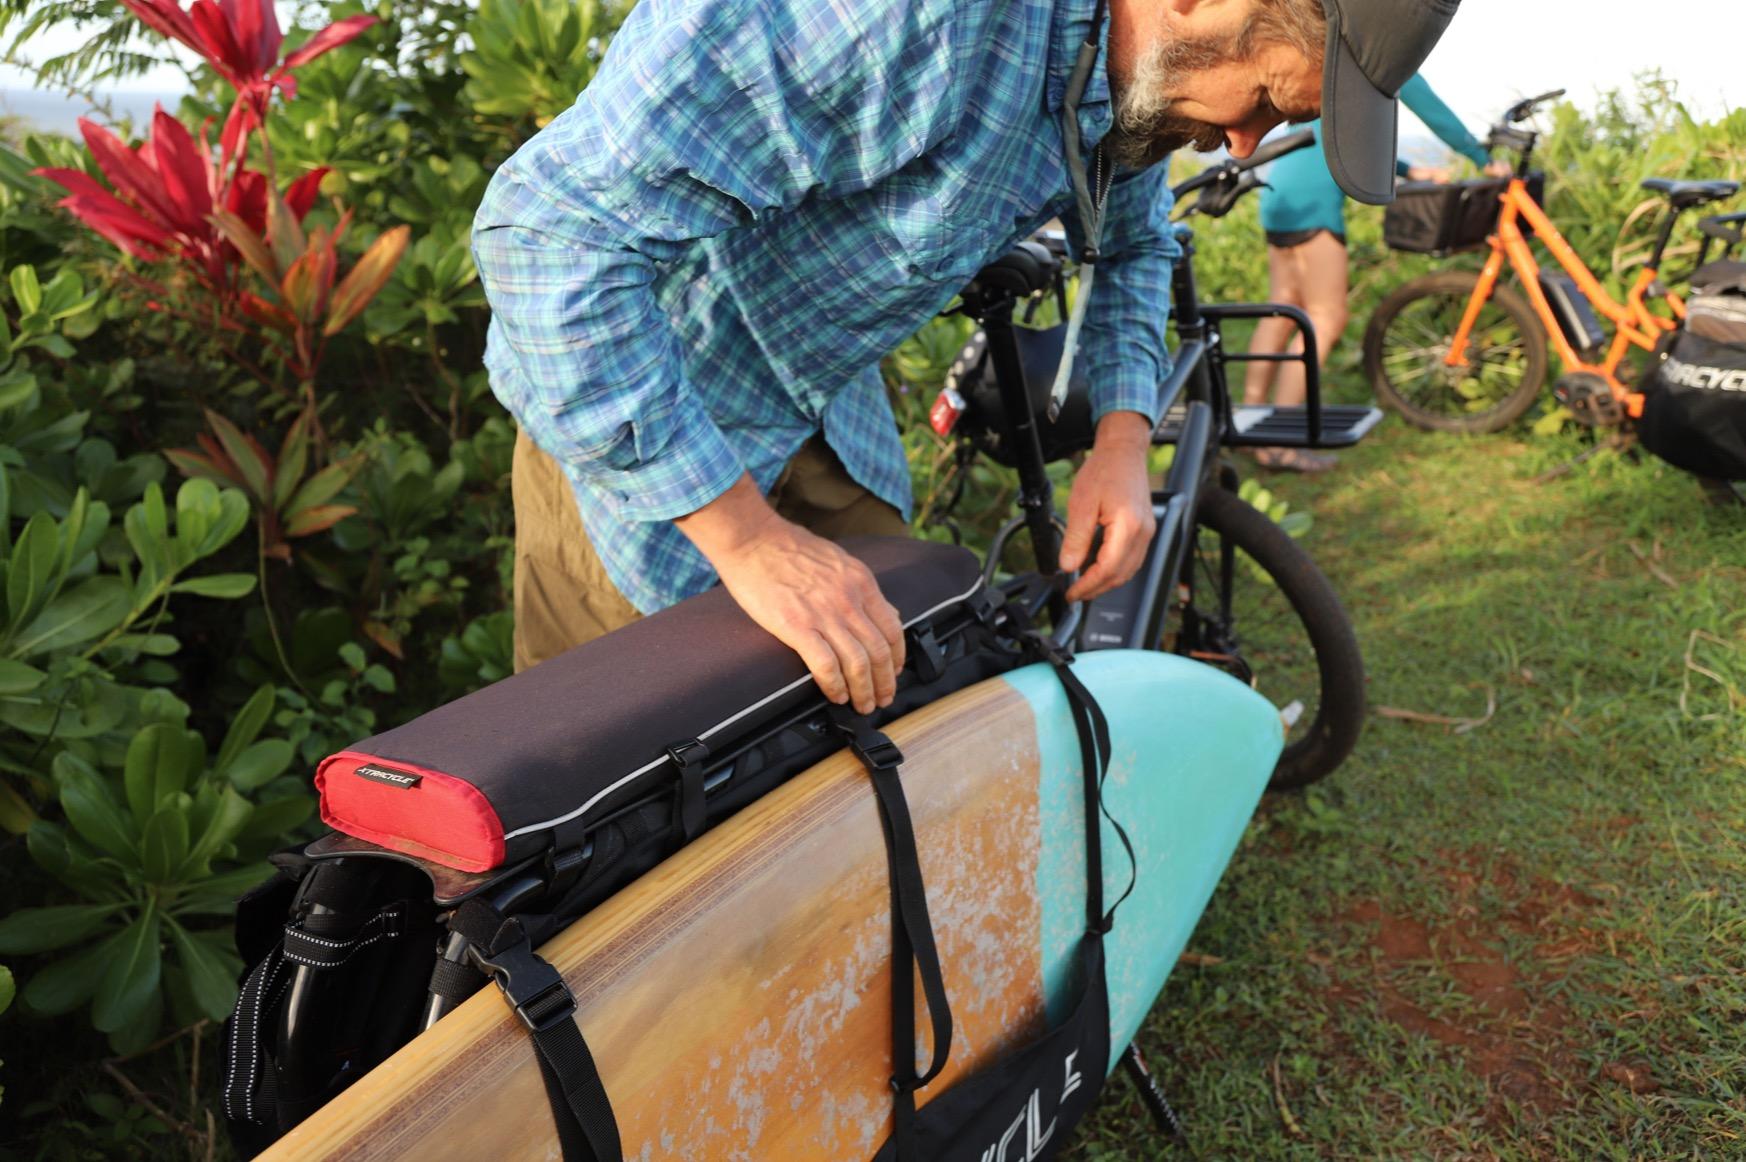 xtracycle-stoker-cargo-bike-seattle